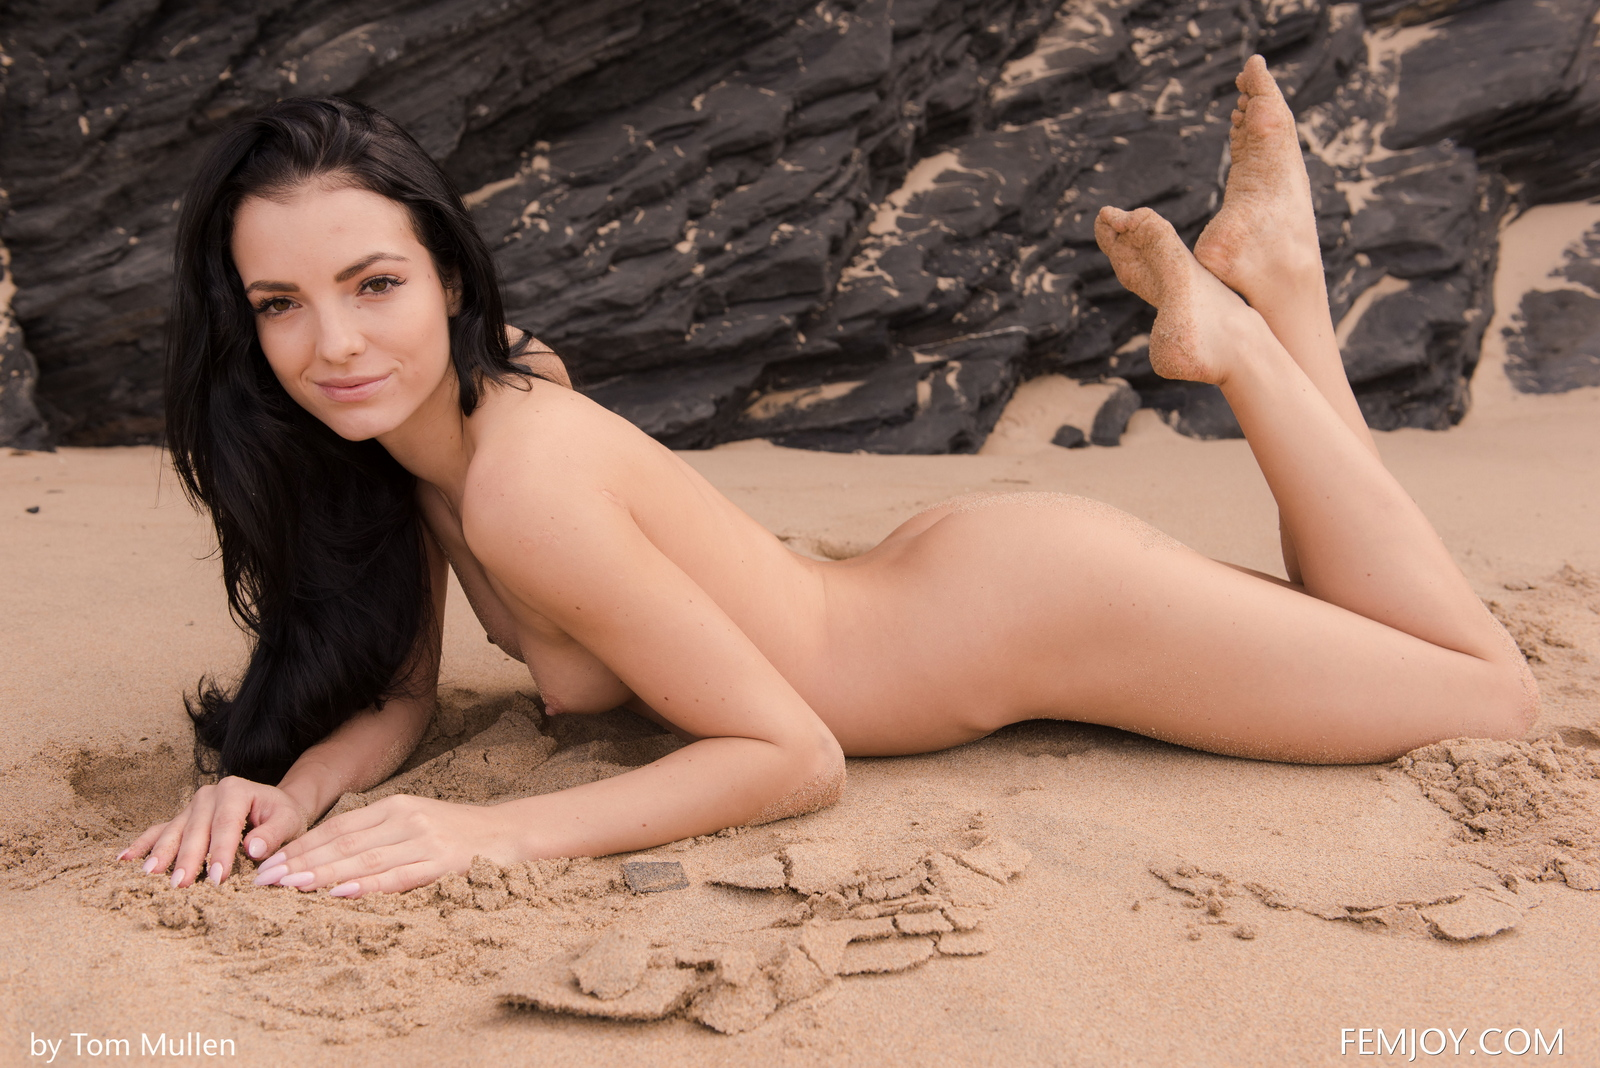 sapphira-brunette-beach-naked-bikini-seaside-femjoy-42